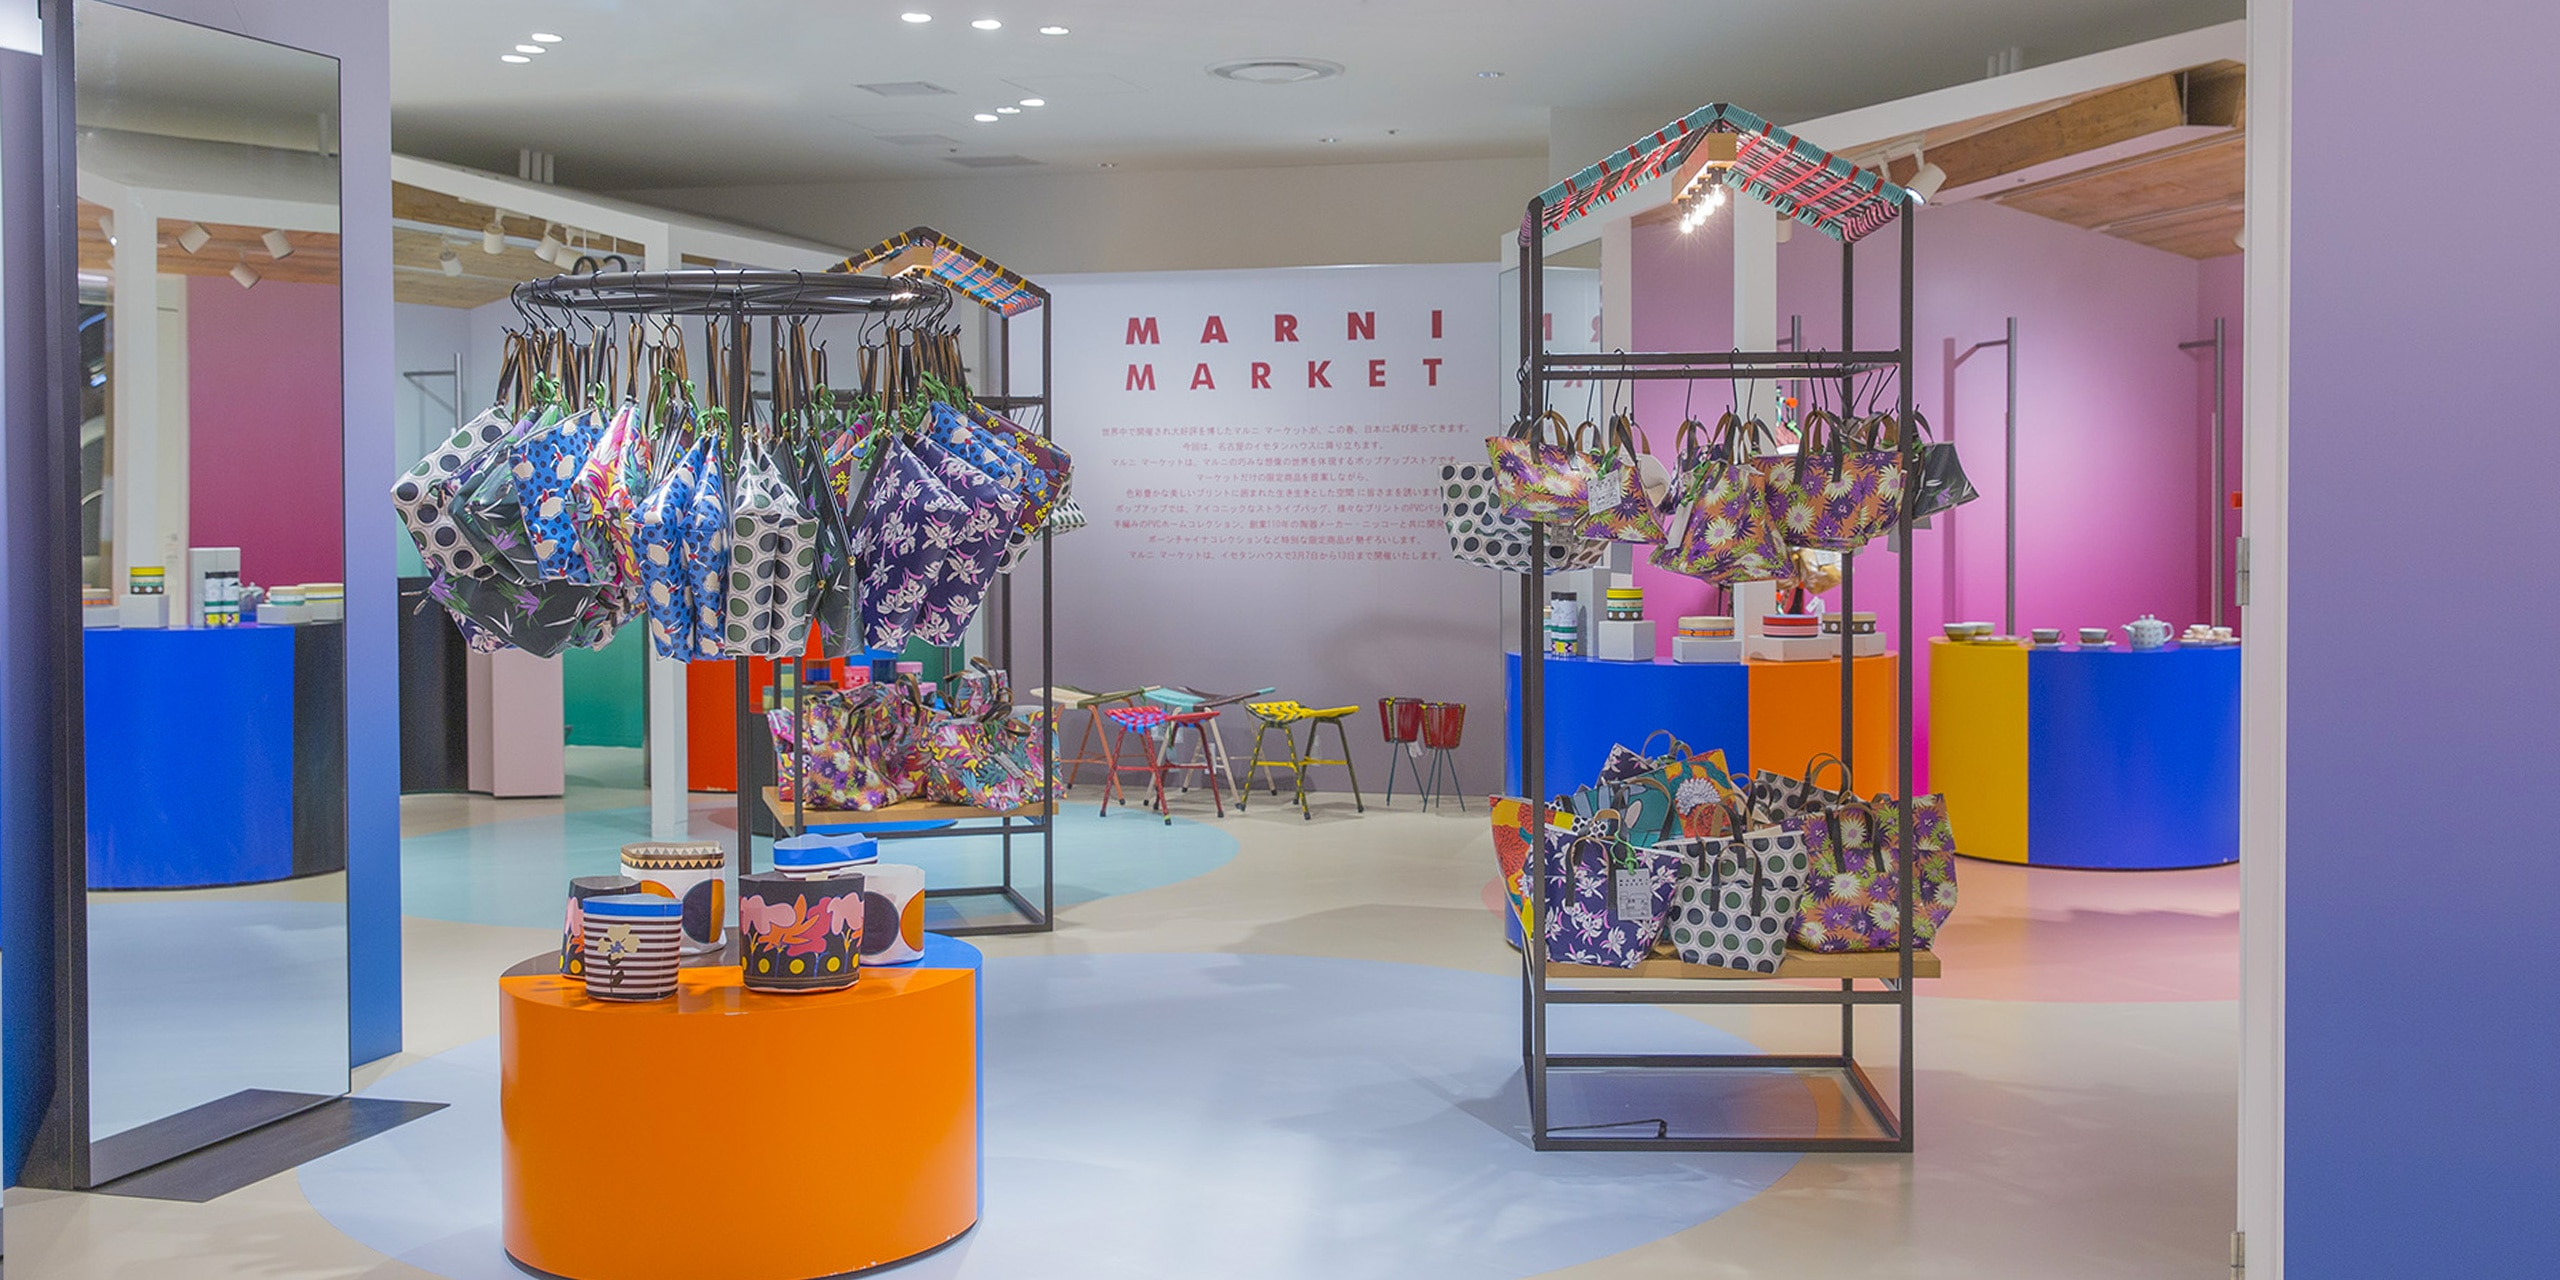 Marni Market pop up in Nagoya and Fukuoka 2017 interior 1